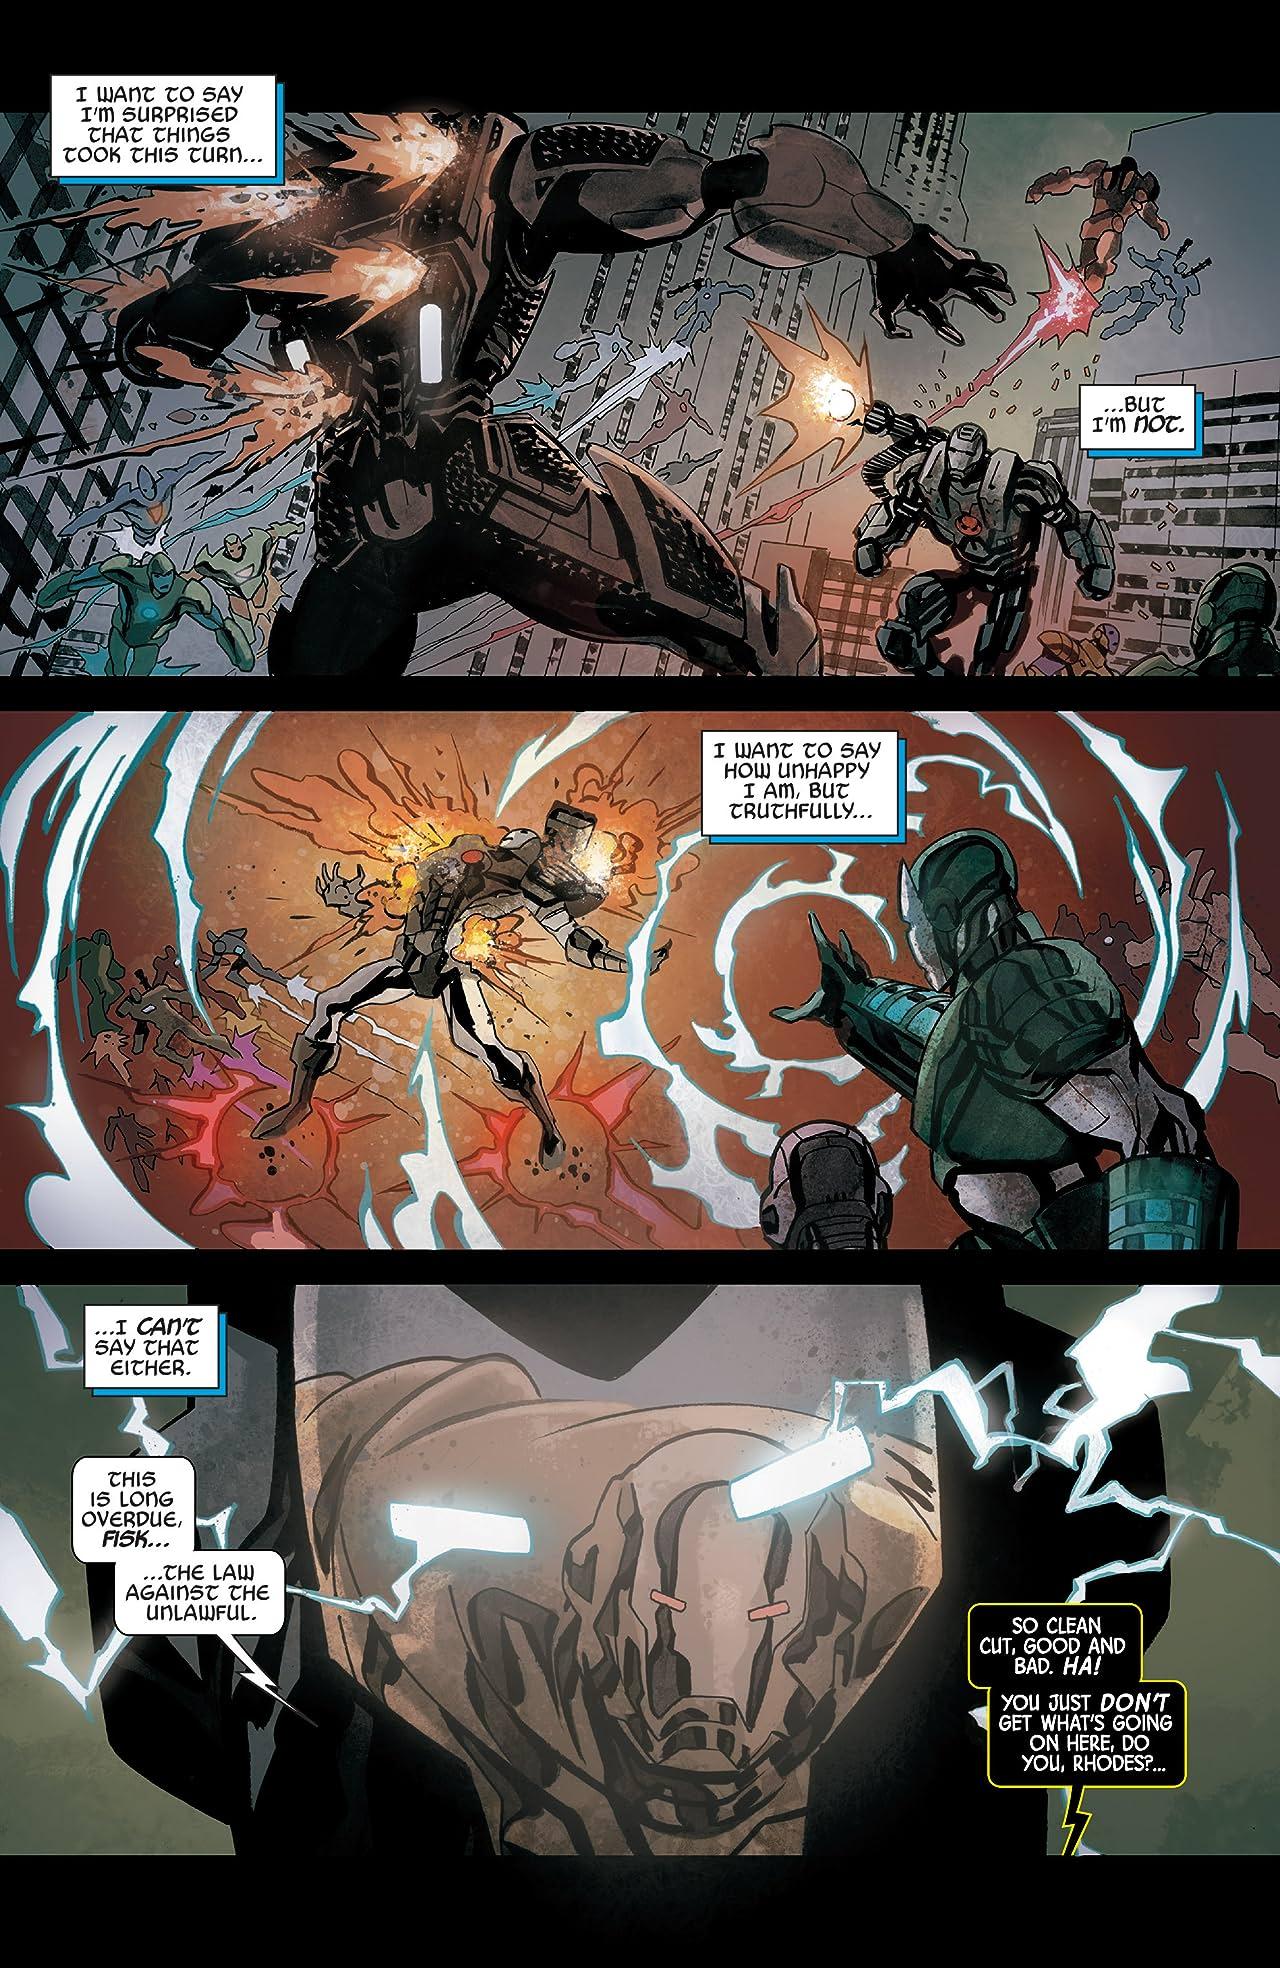 Armor Wars (2015) #4